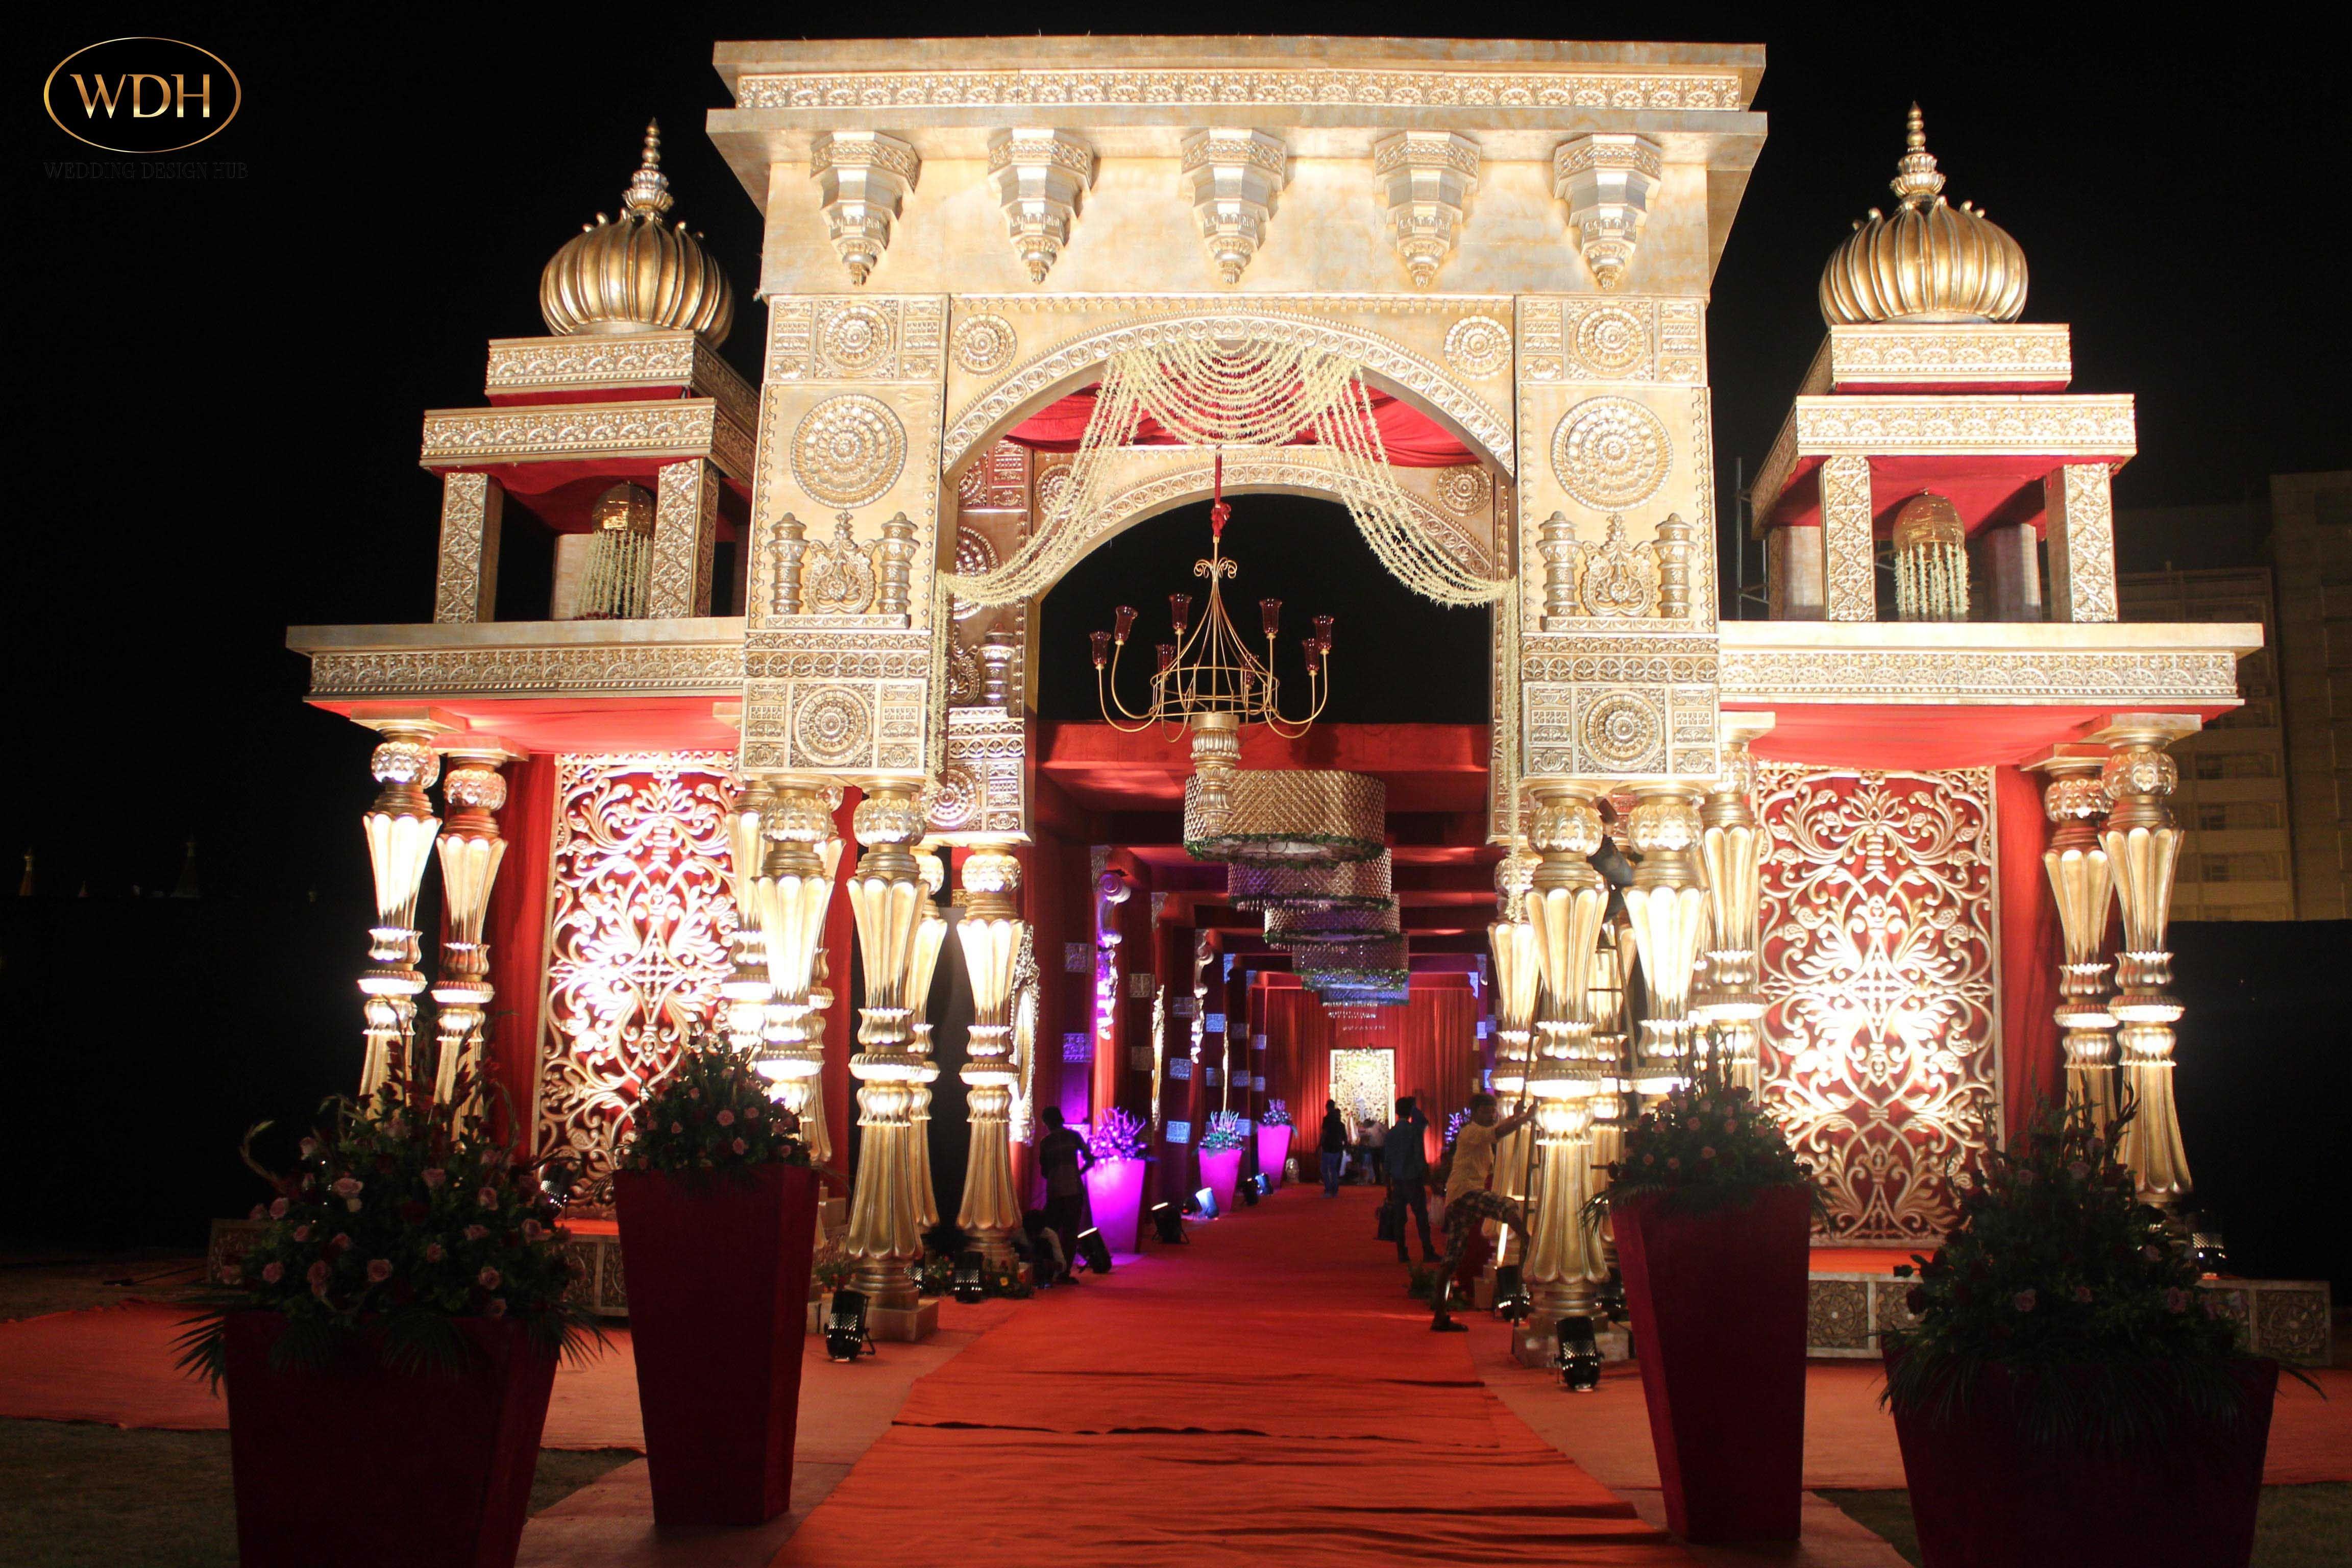 Wedding Decoration Items Manufacturer Wedding Design Hub Wedding Stage Design Wedding Stage Backdrop Wedding Stage Decorations